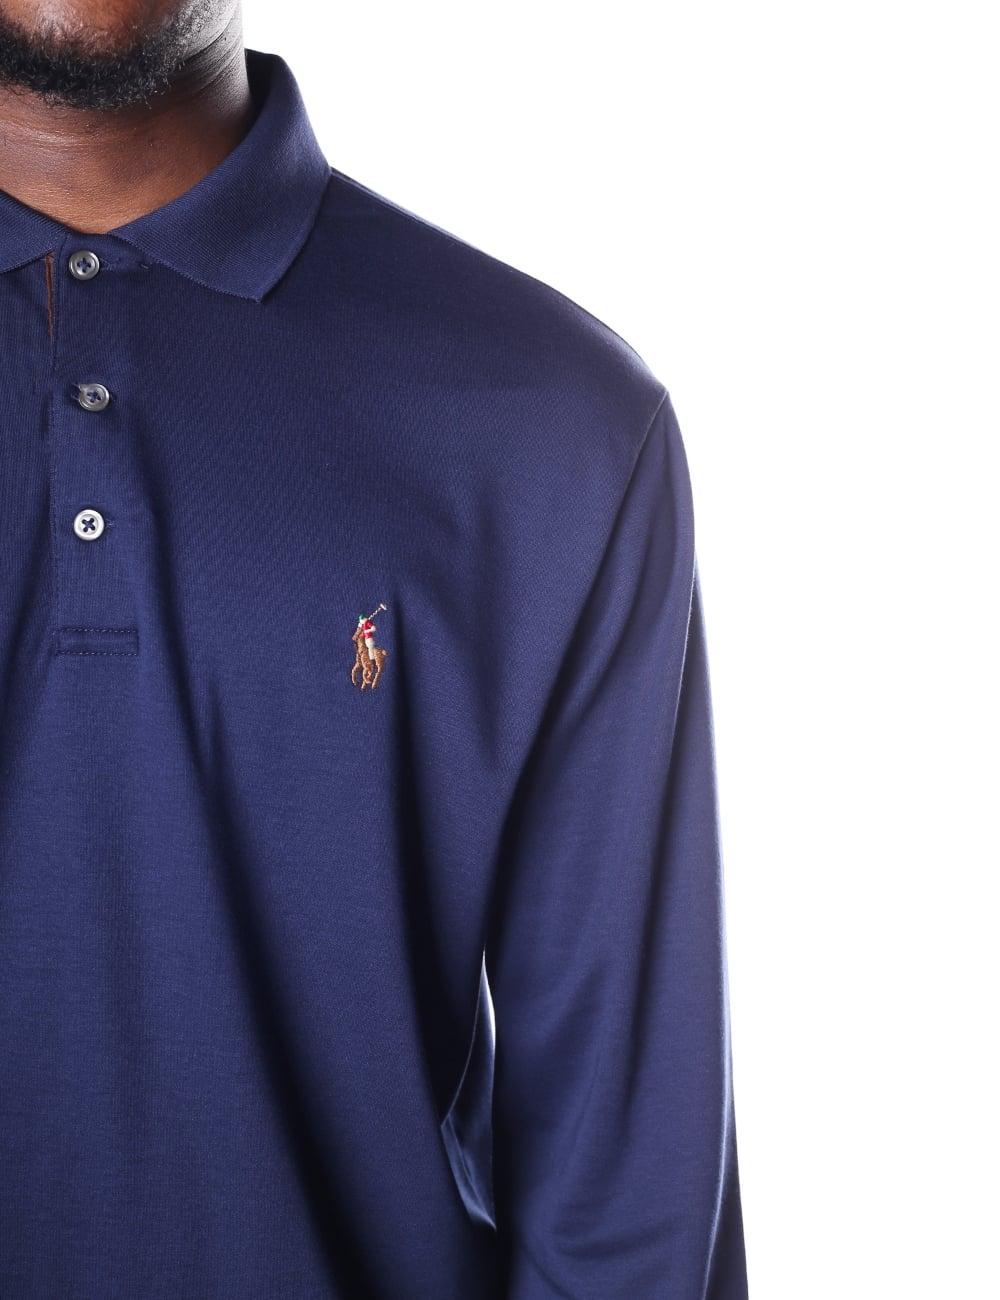 9b0590e16 ... Polo Ralph Lauren Men s Custom Slim Fit Long Sleeve Polo Top. Tap image  to zoom. Men  039 s Custom Slim Fit Long Sleeve ...